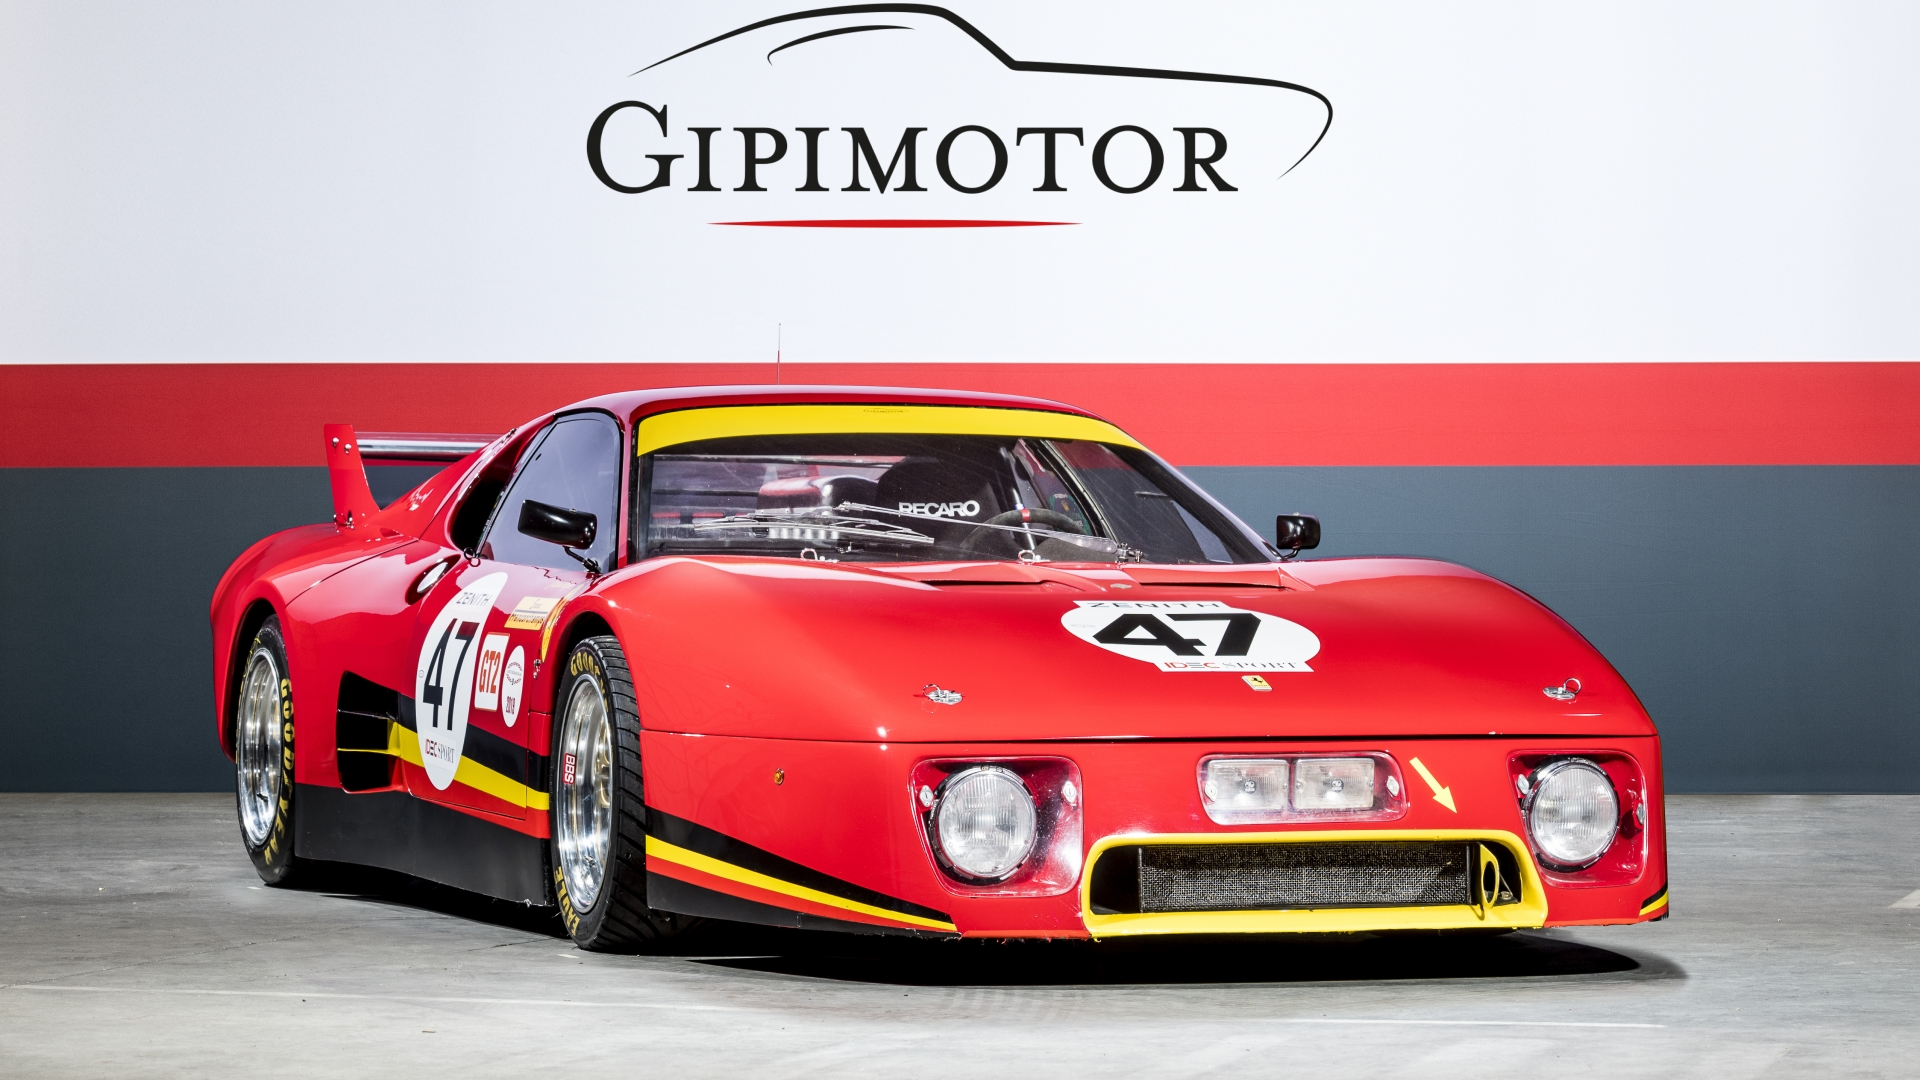 Ferrari - 512 BB LM · Gipimotor